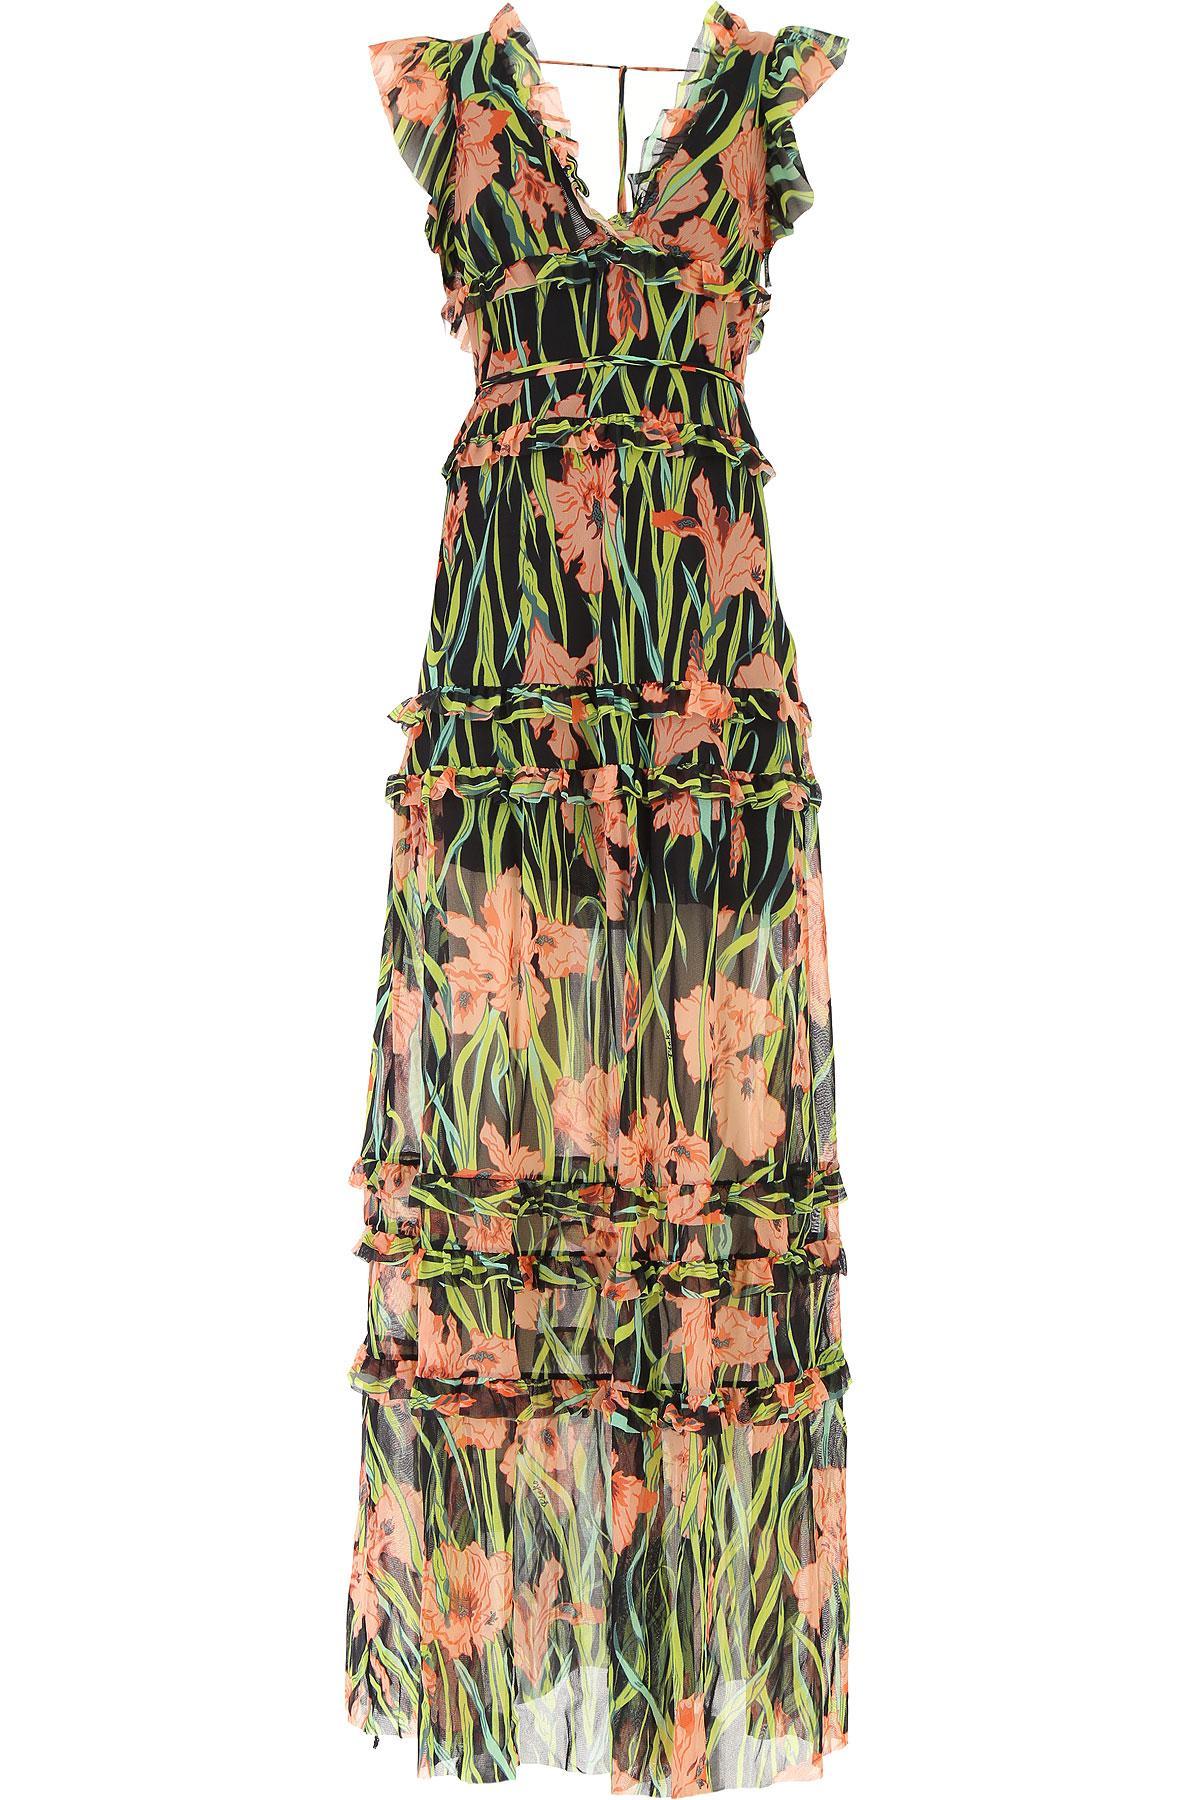 86004d639e7 Lyst - Pinko Dress For Women in Black